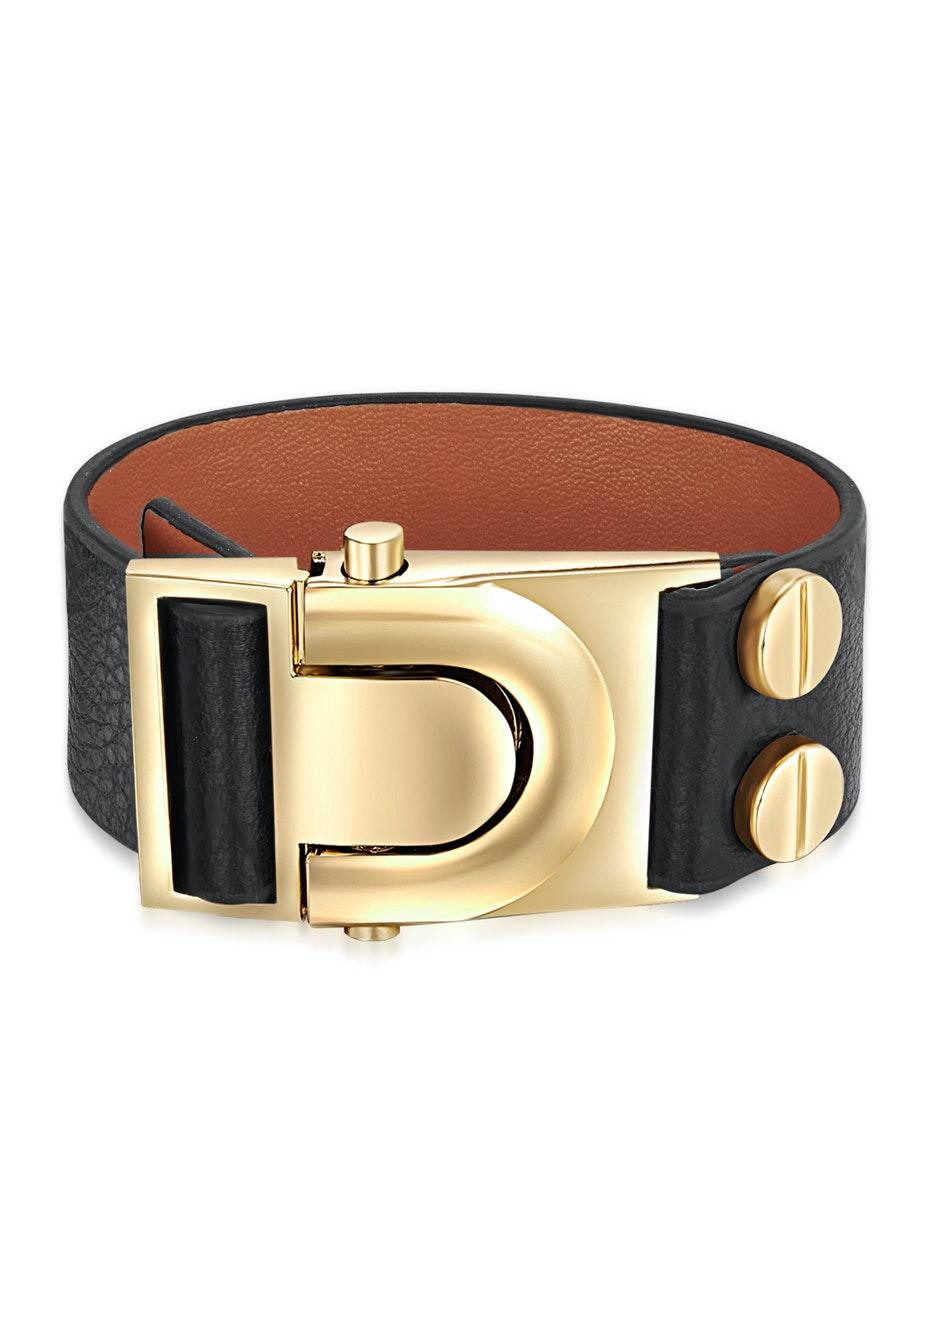 Genuine Cow Leather Clasp Bracelet - BLK